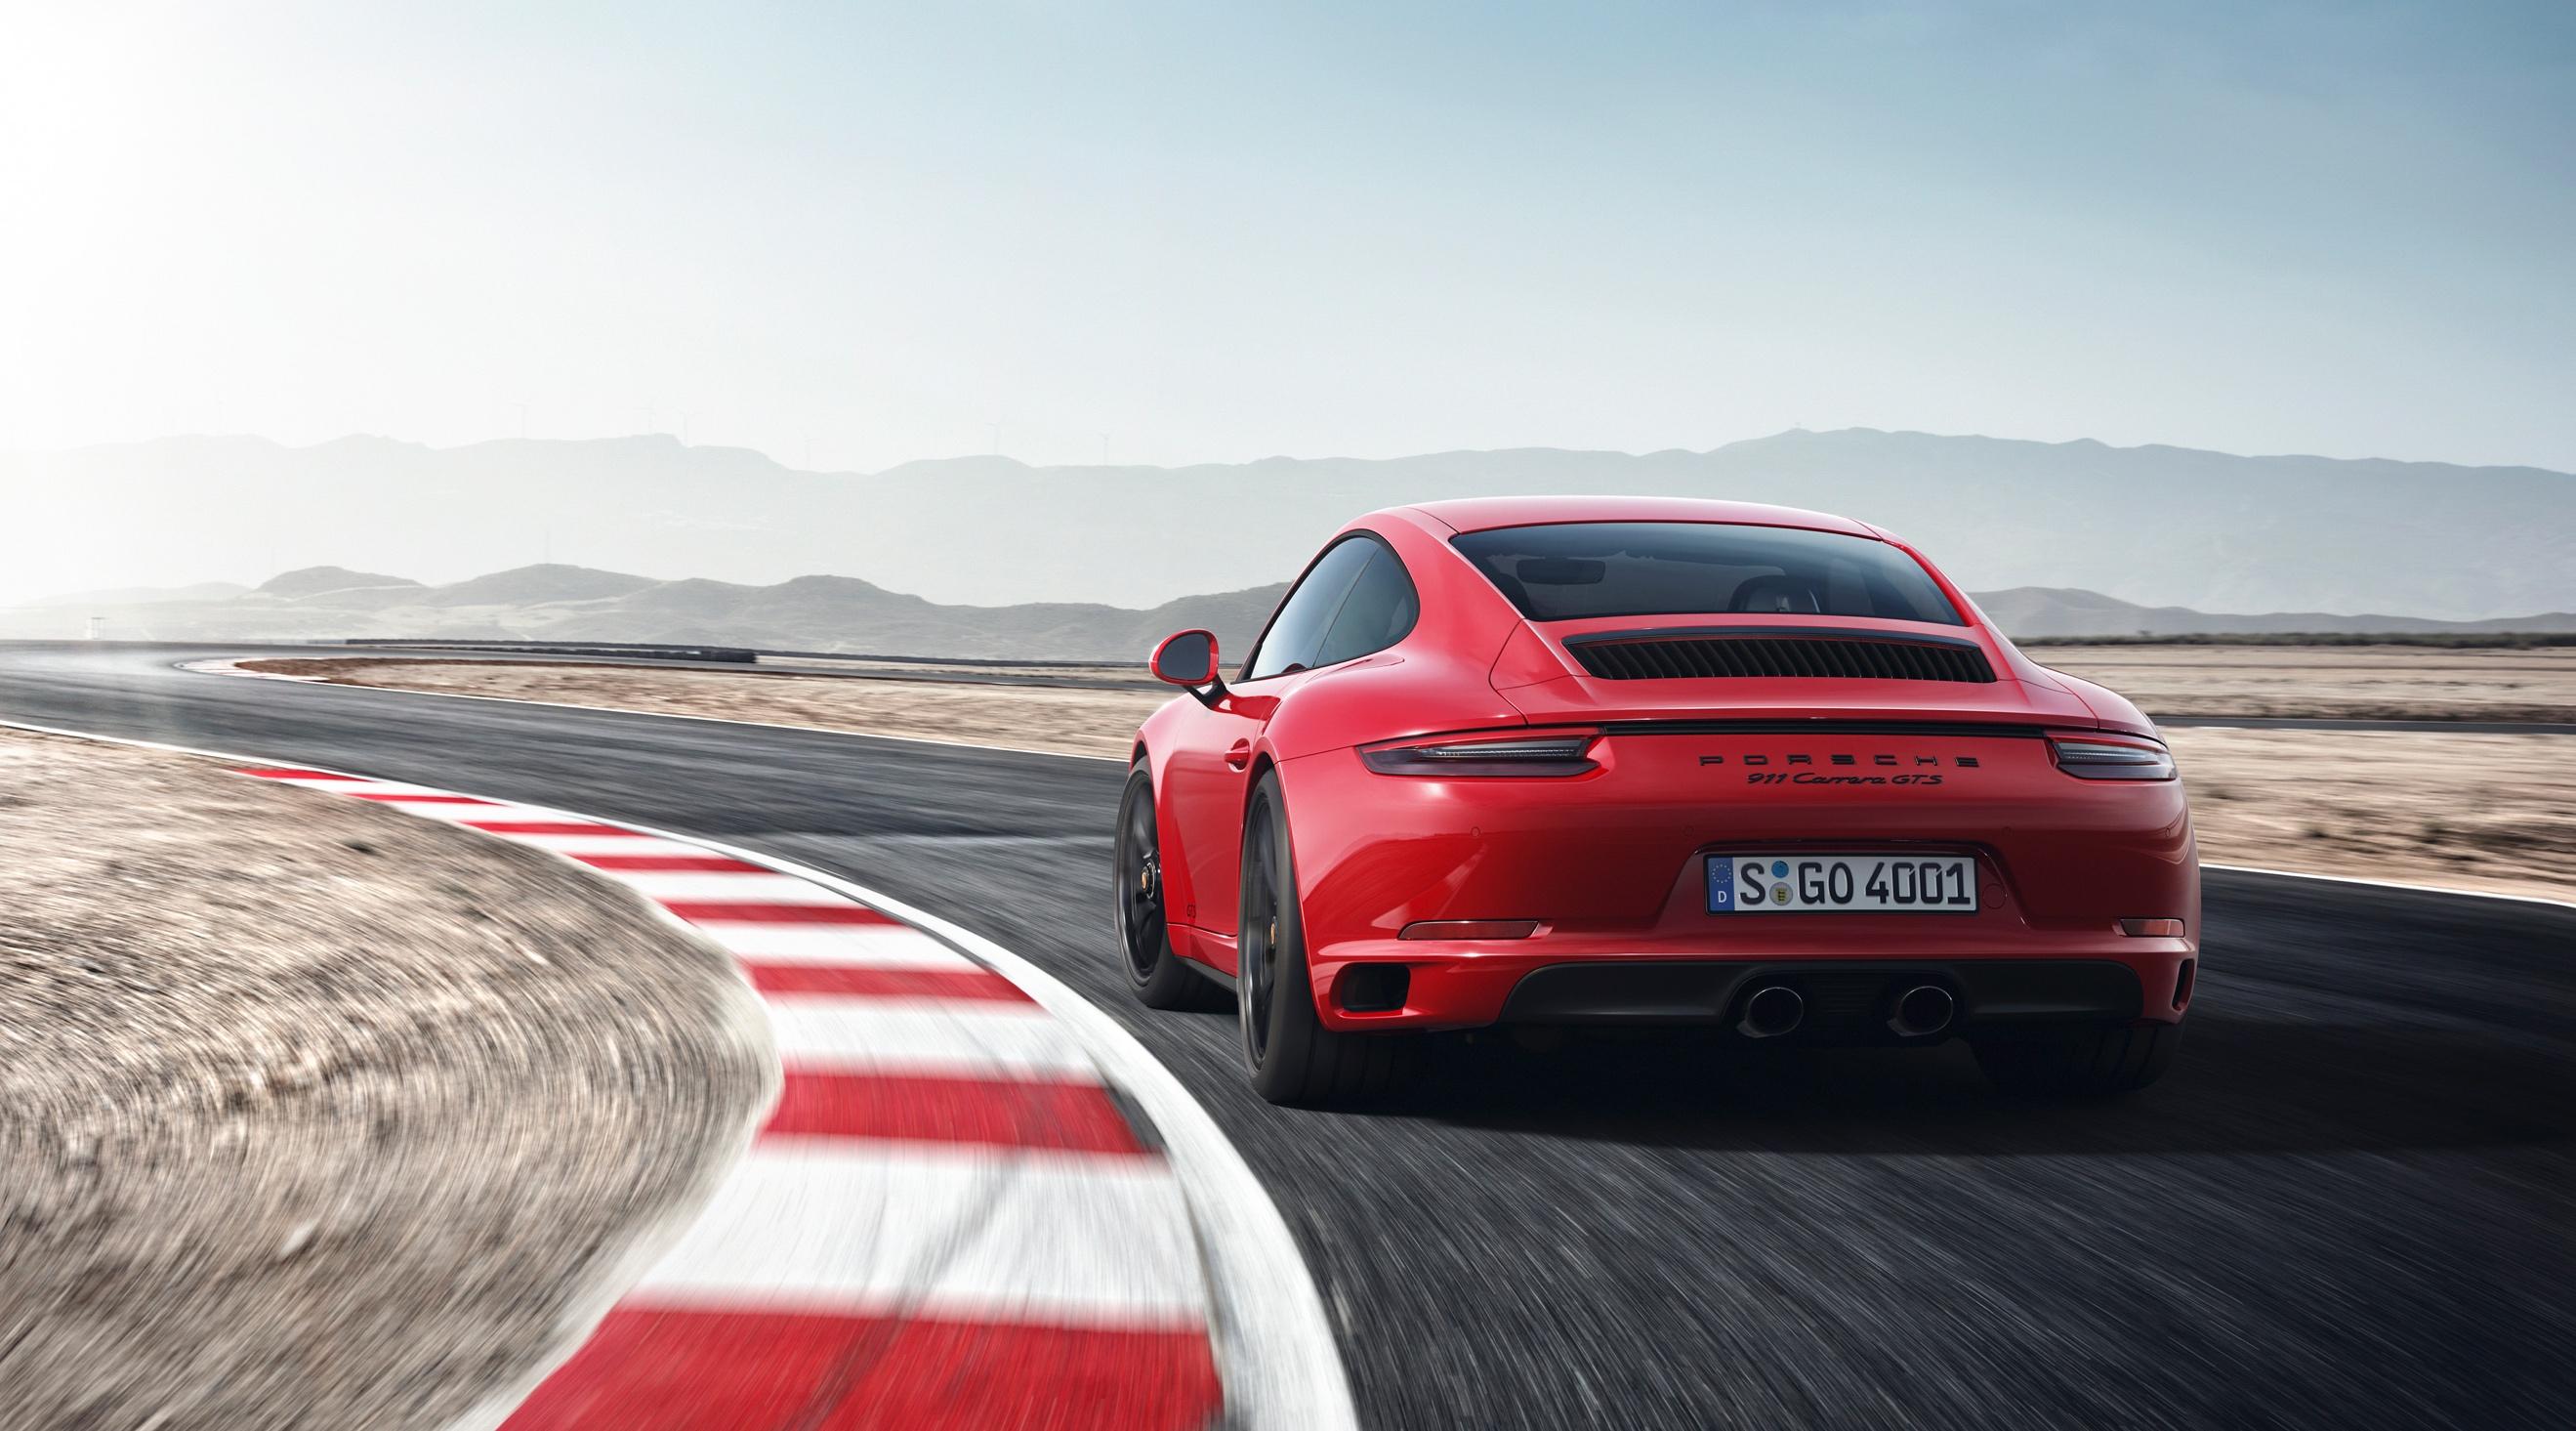 ../Porsche%20Press%20Kits/done/00003_911GTSLaunch/P16_1040_a4_rgb.jpg